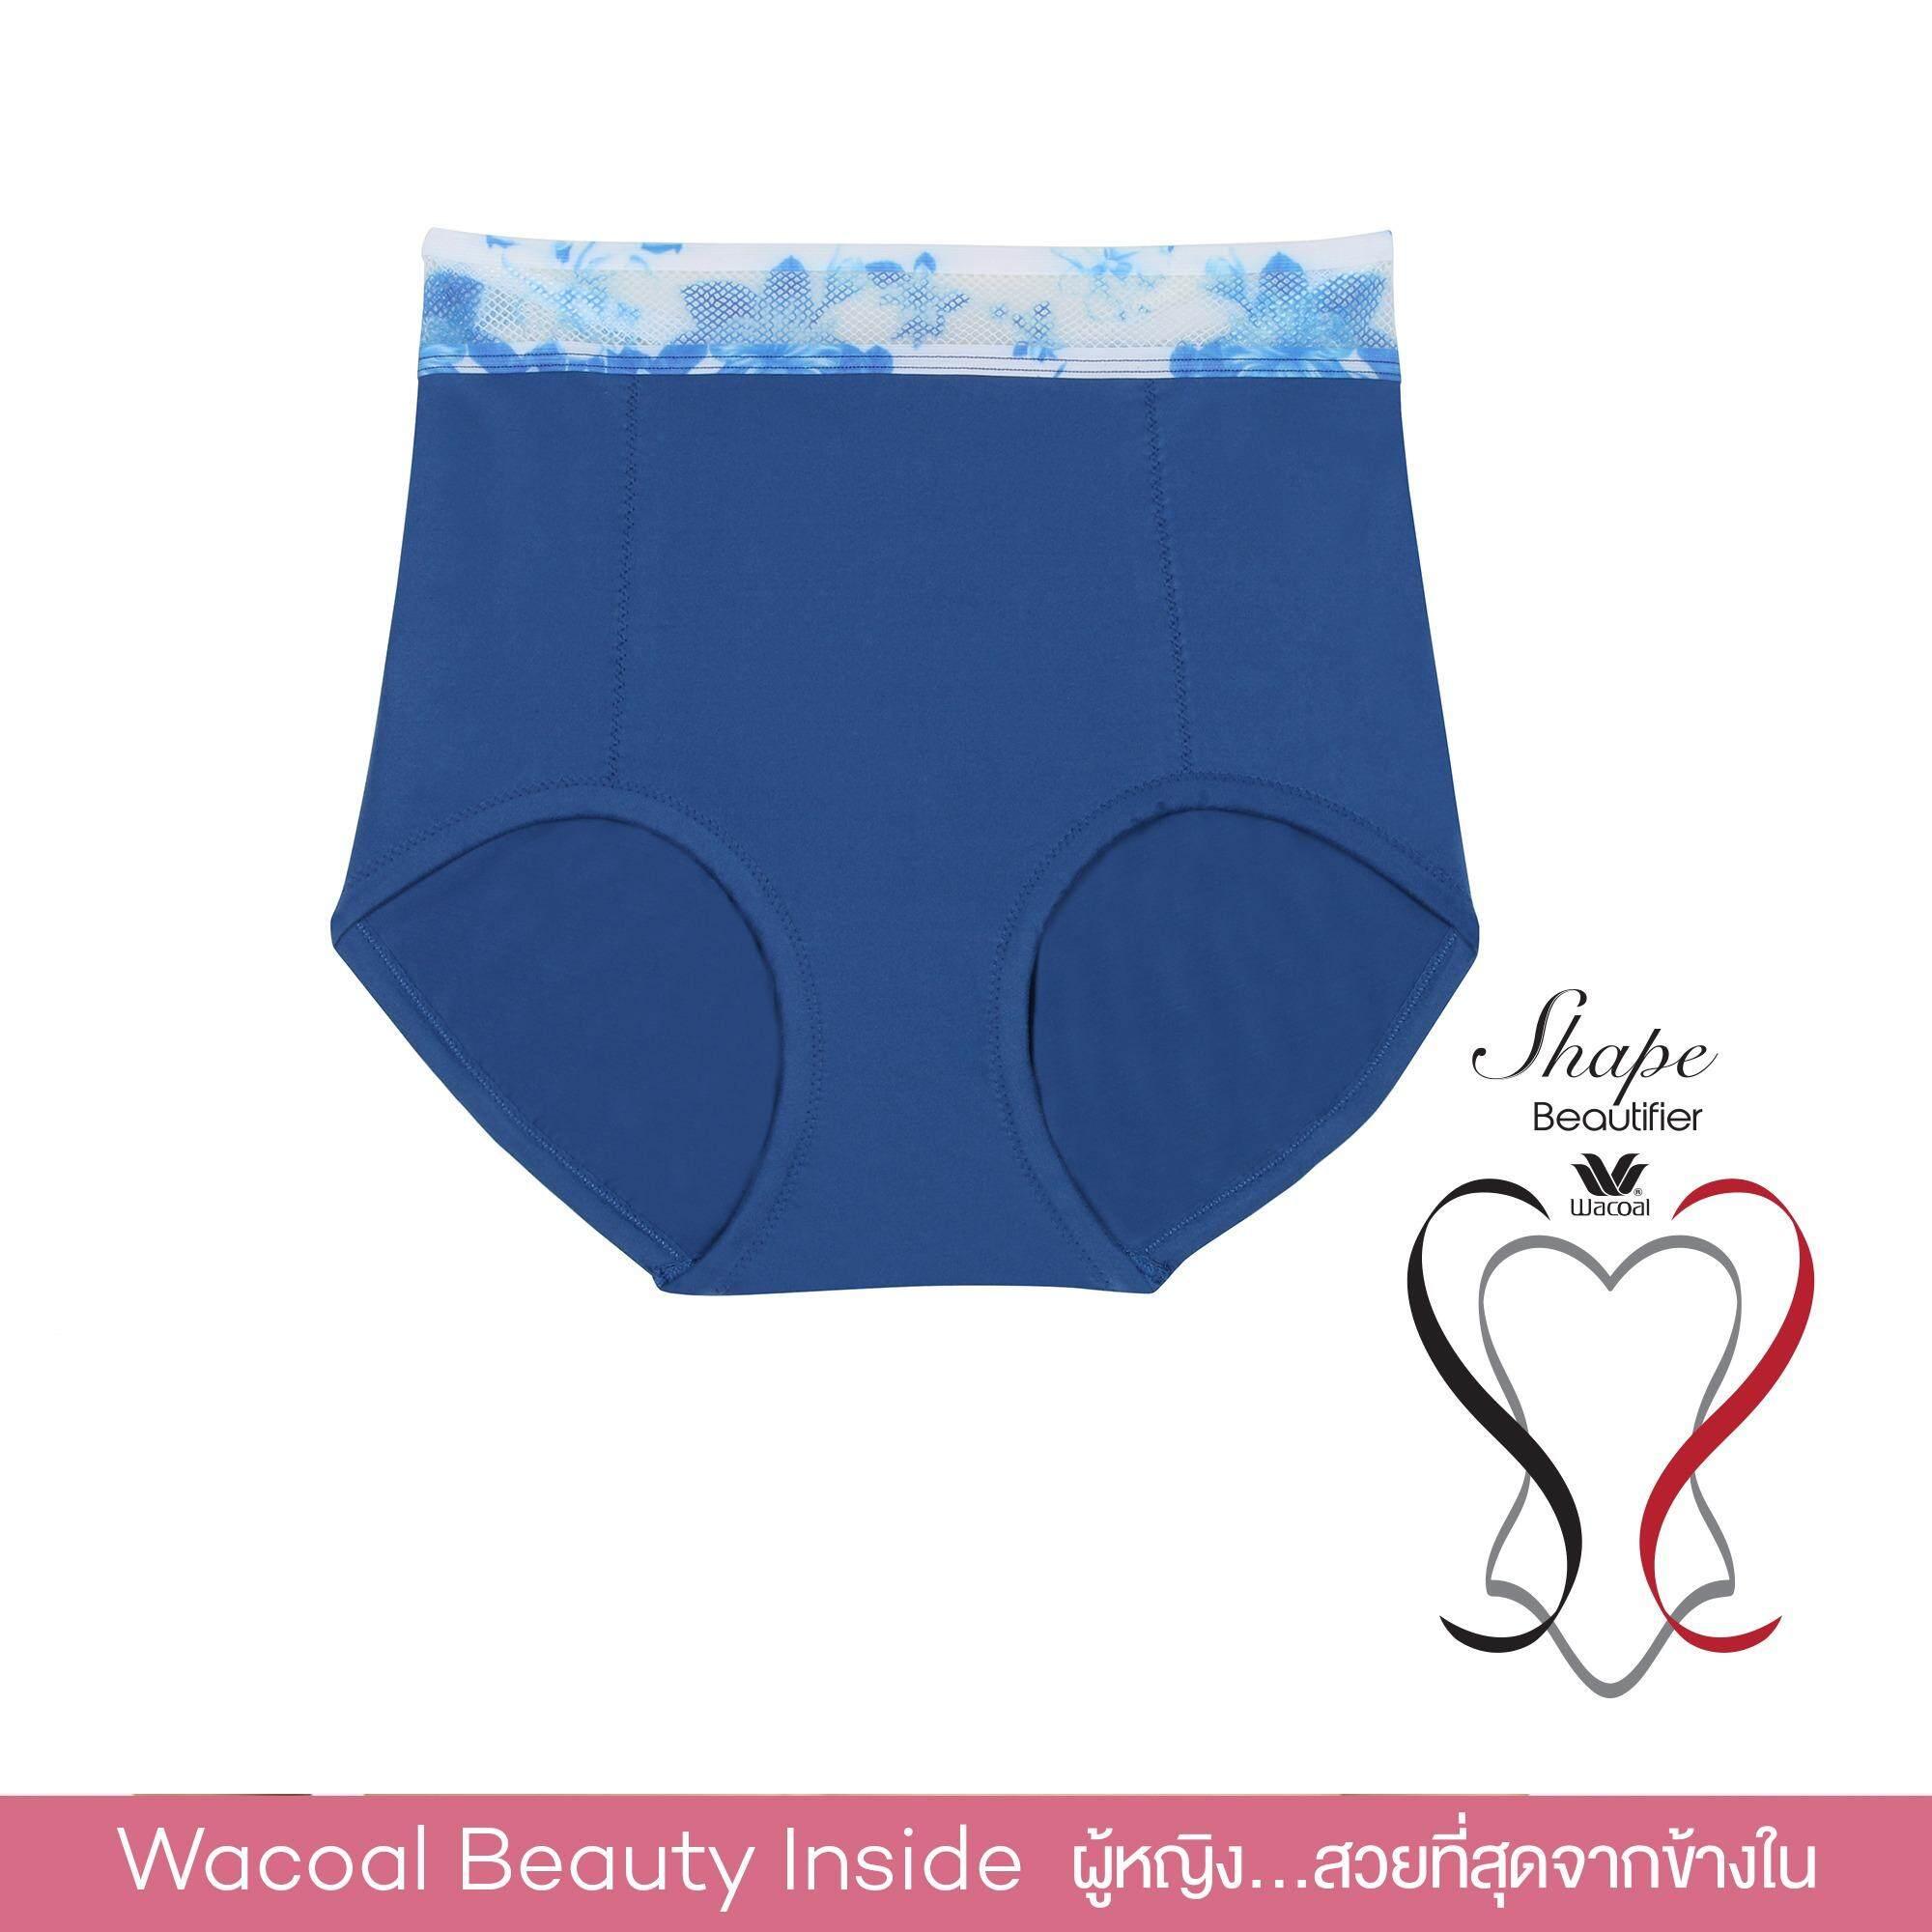 Wacoal Shape beautifier Pants กางเกงเก็บกระชับ (สีน้ำเงิน/BLUE) - WY1298BU